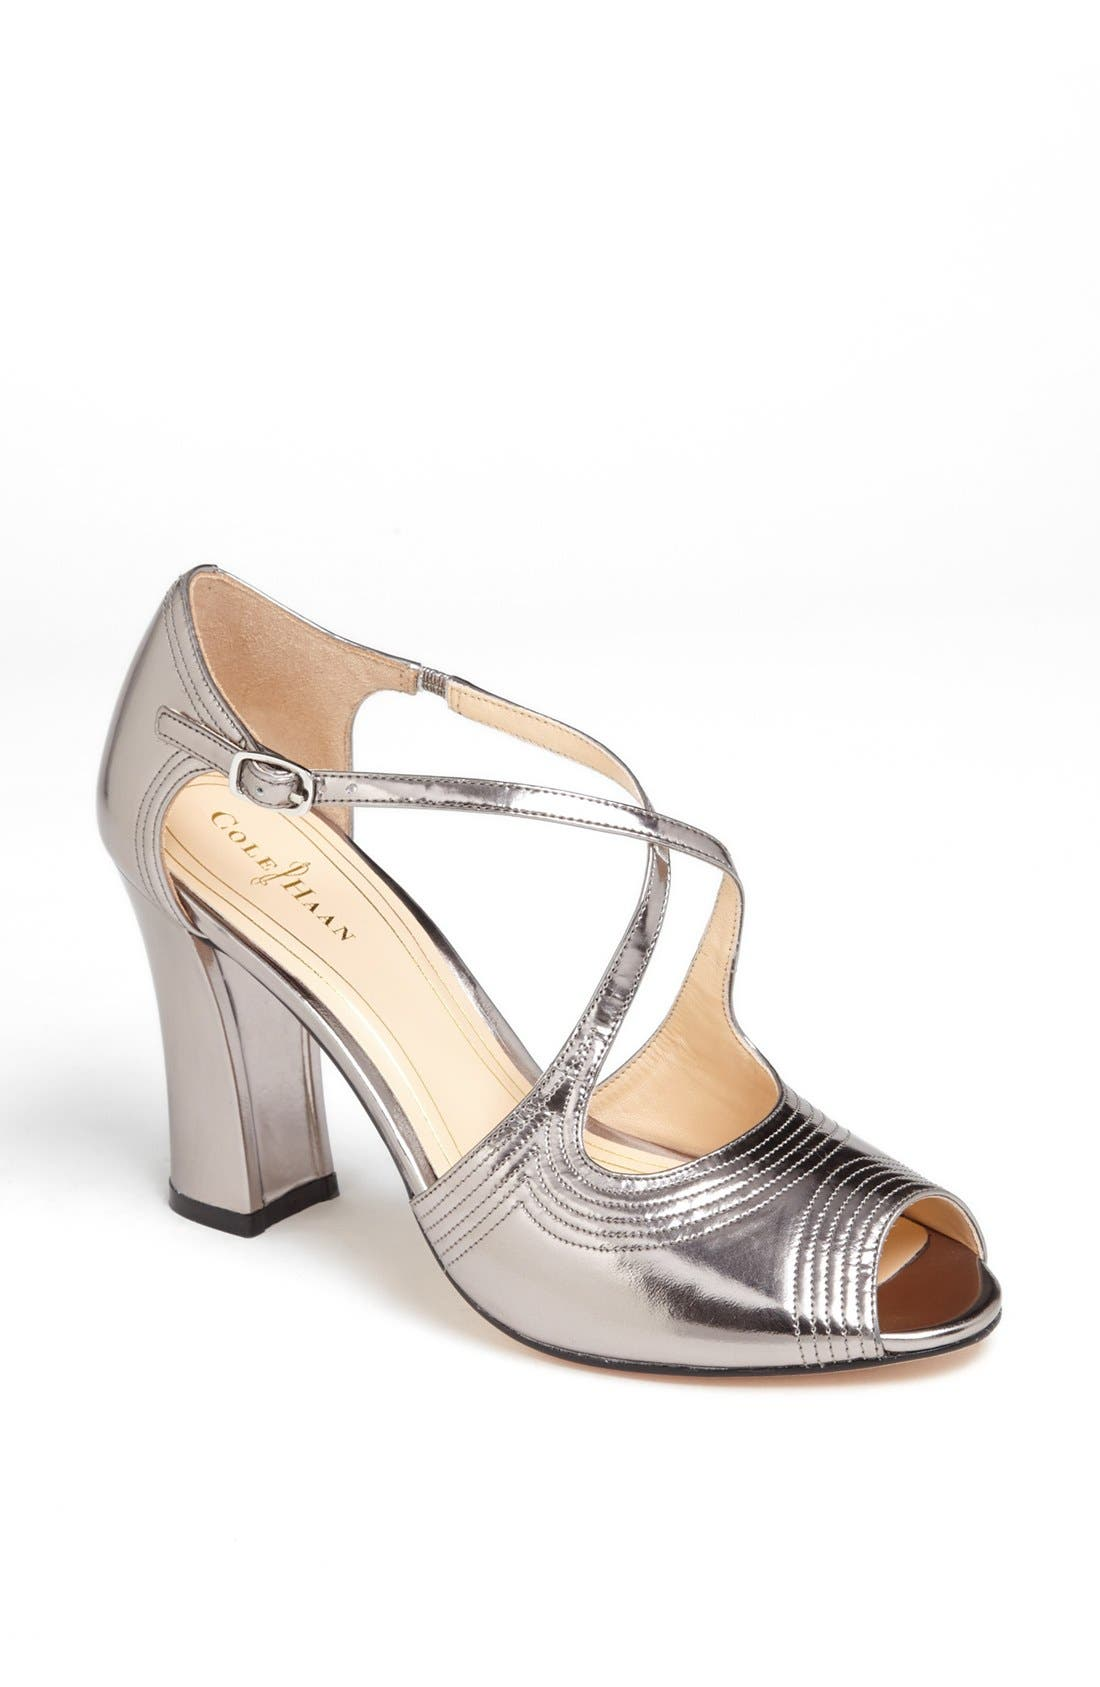 Main Image - Cole Haan 'Jovie' Mirrored Sandal